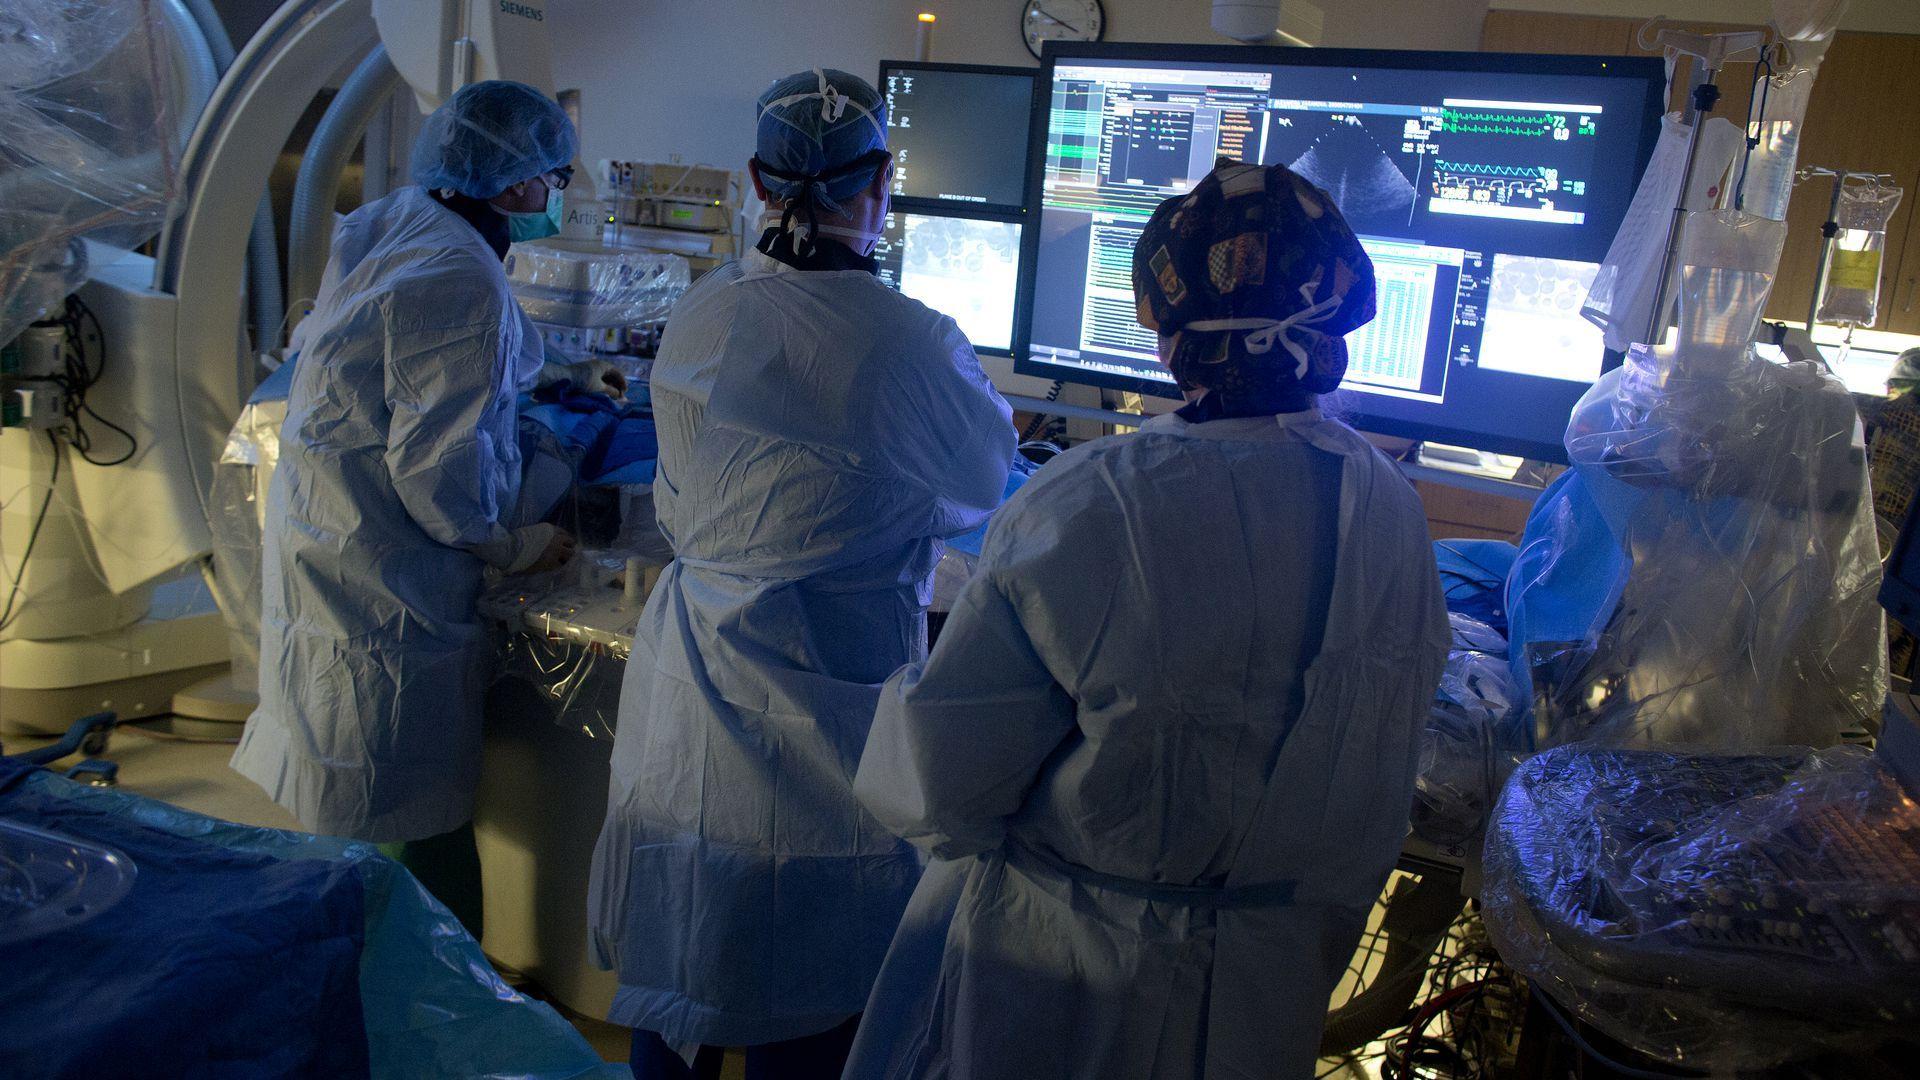 Doctors in sterile garb looking at computers